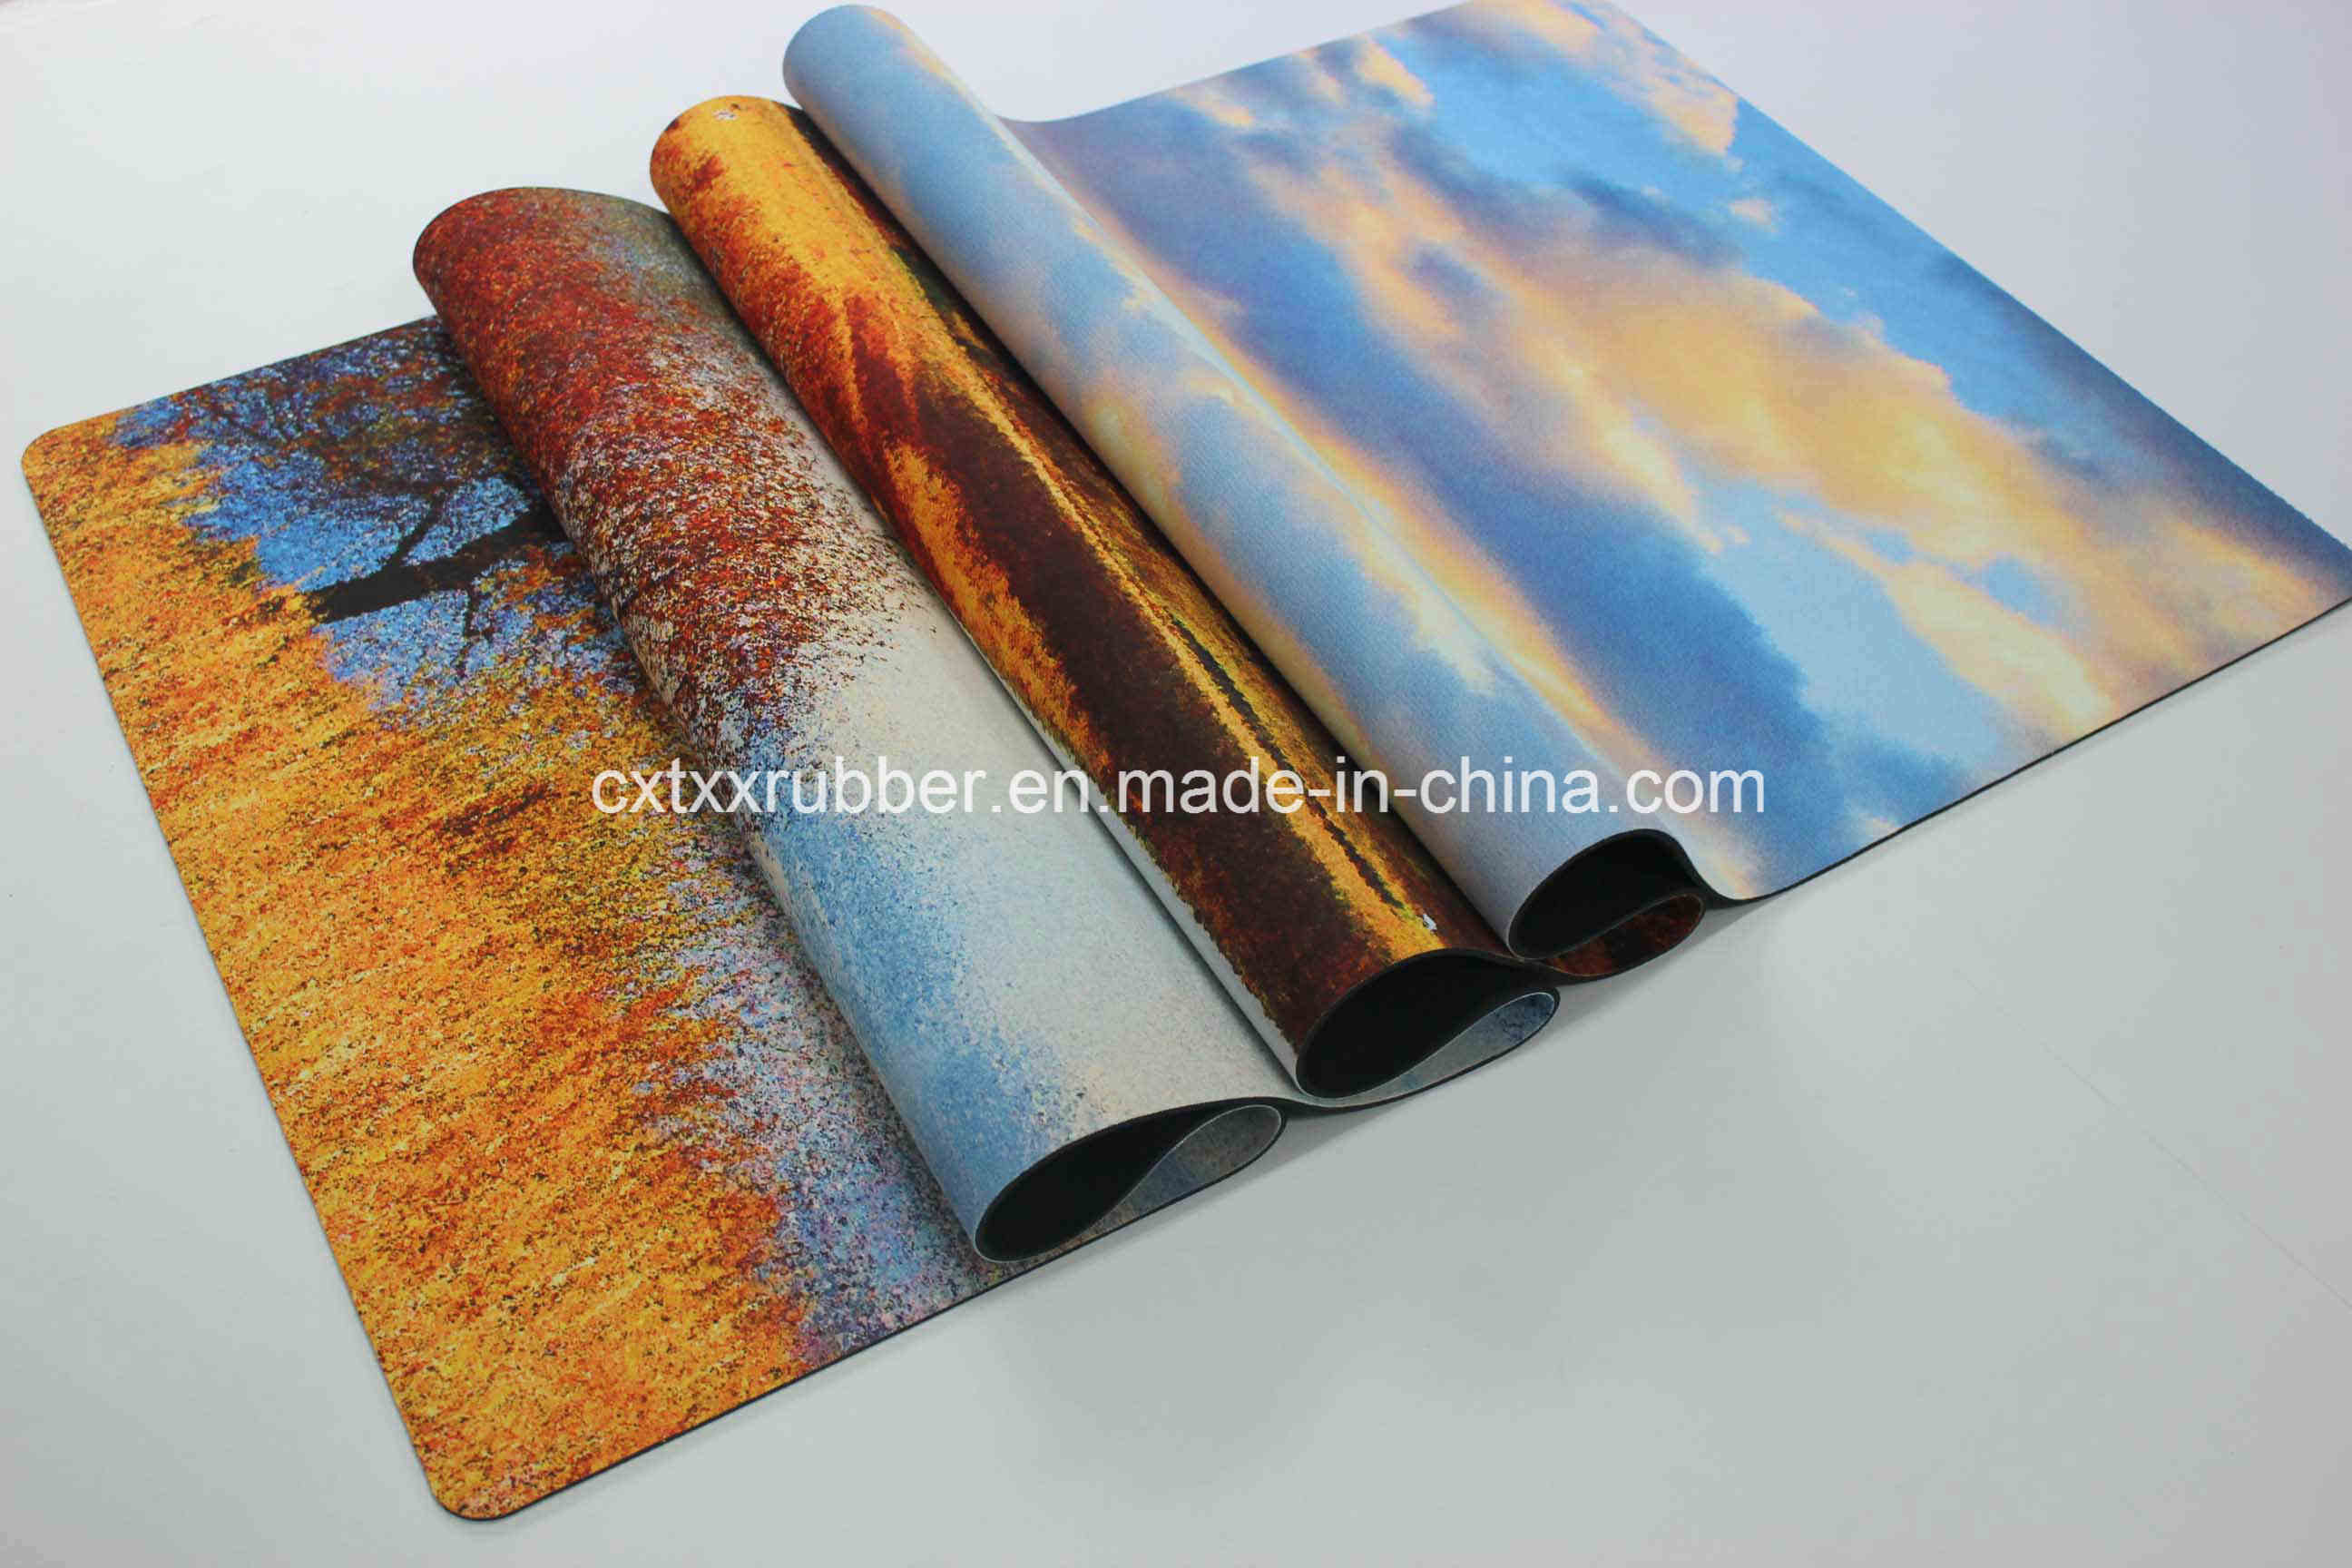 detail yogamat sweatflix rubber yoga bodyrock natural products mats mat